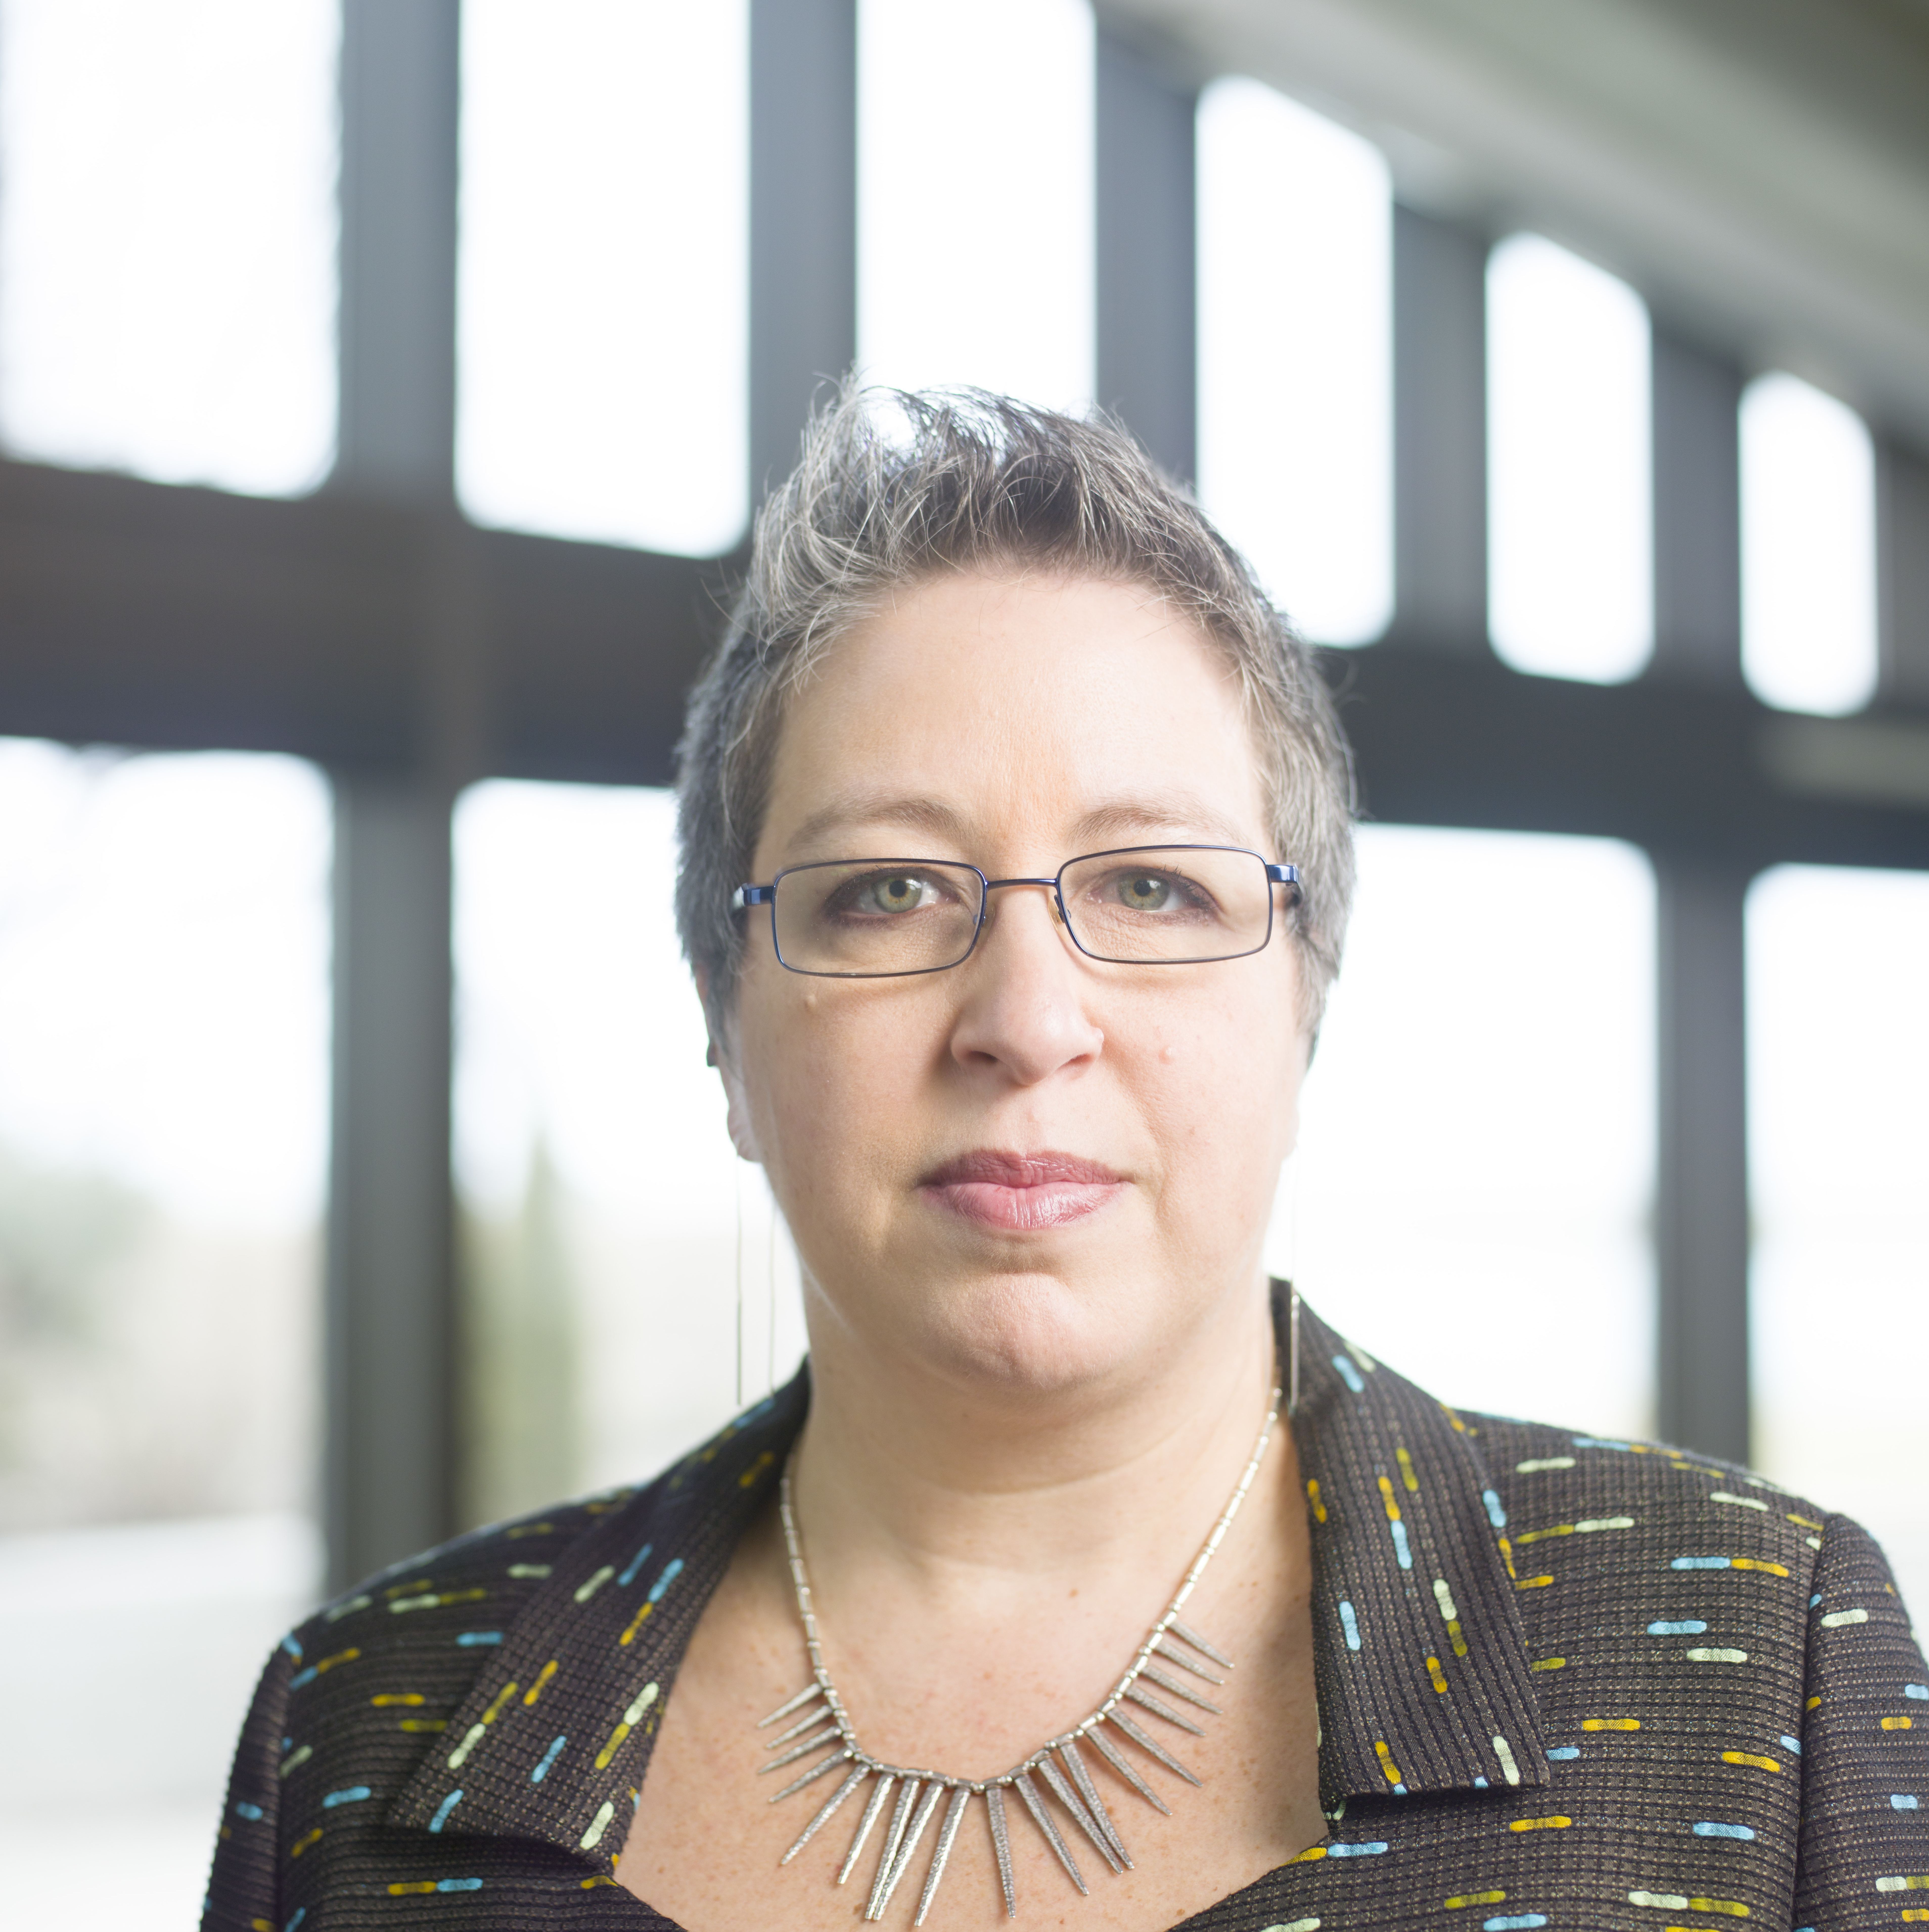 Megan Kashner, Northwestern University, Kellogg School of Management